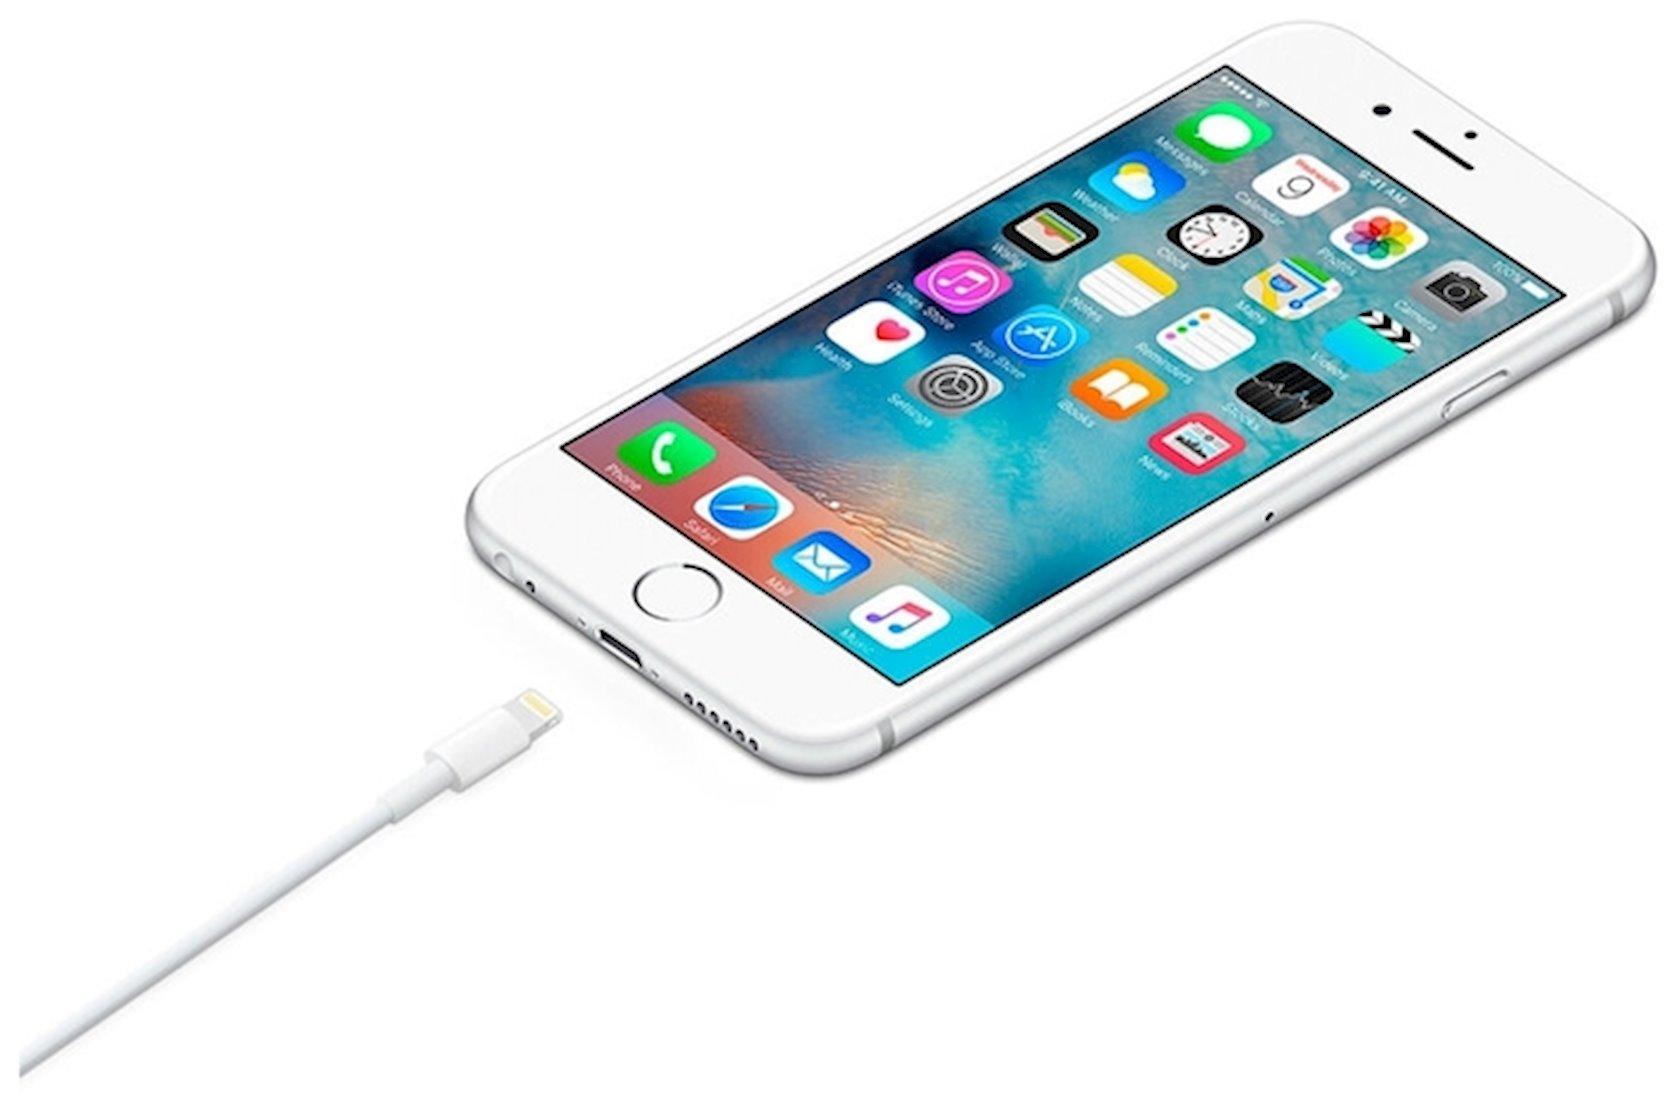 Kabel Apple USB - Lightning (MXLY2ZM/A) 1 m